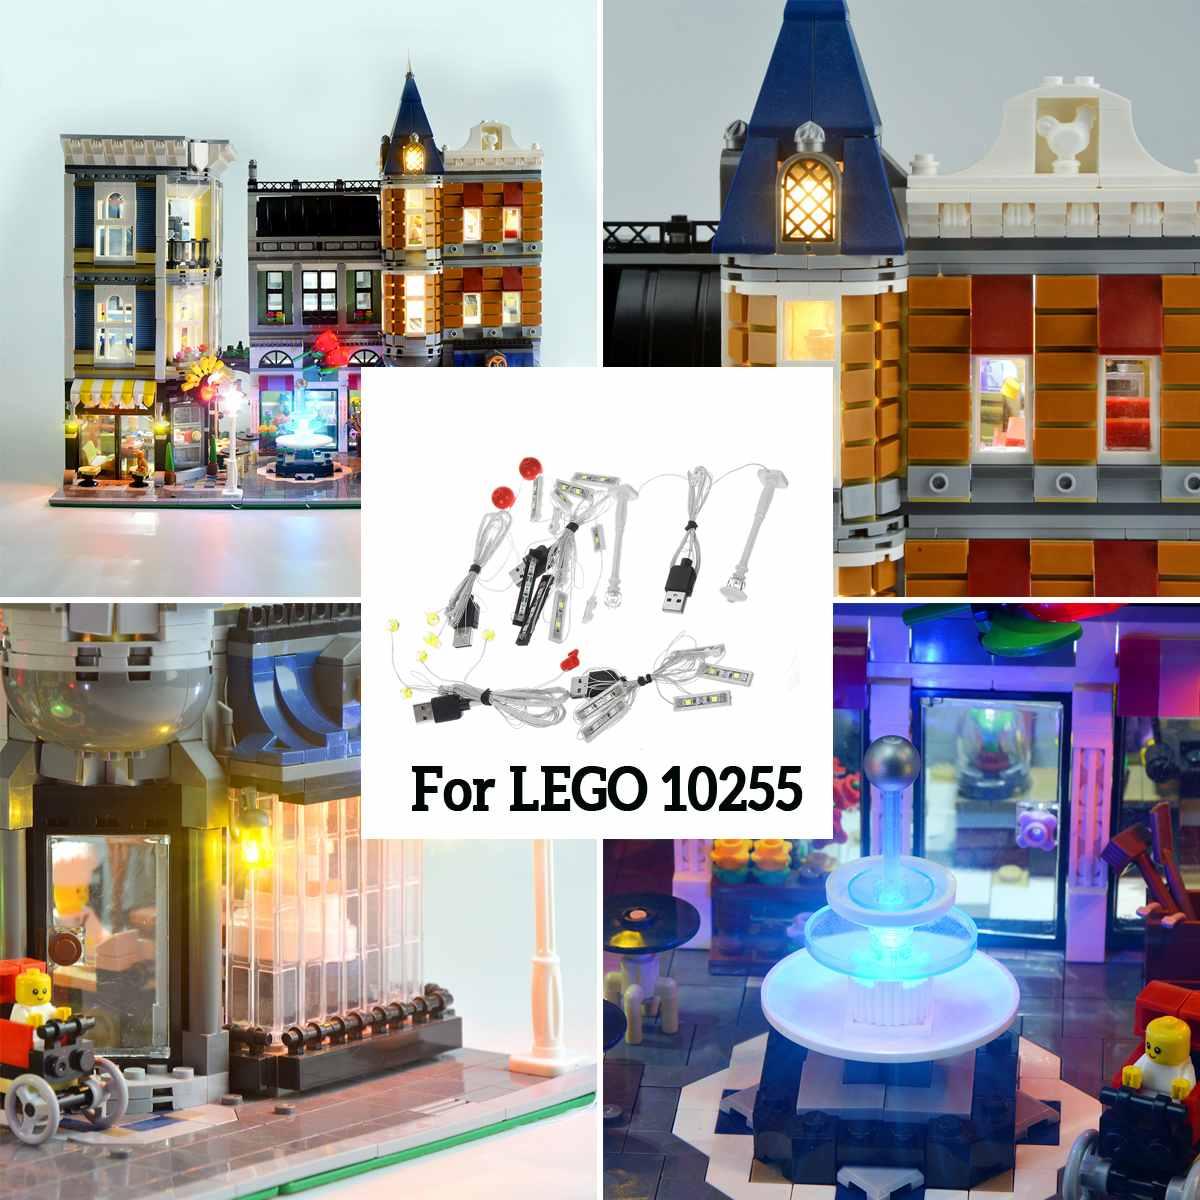 USB Powered LED Light Kit for Lego 10255 Assembly Square